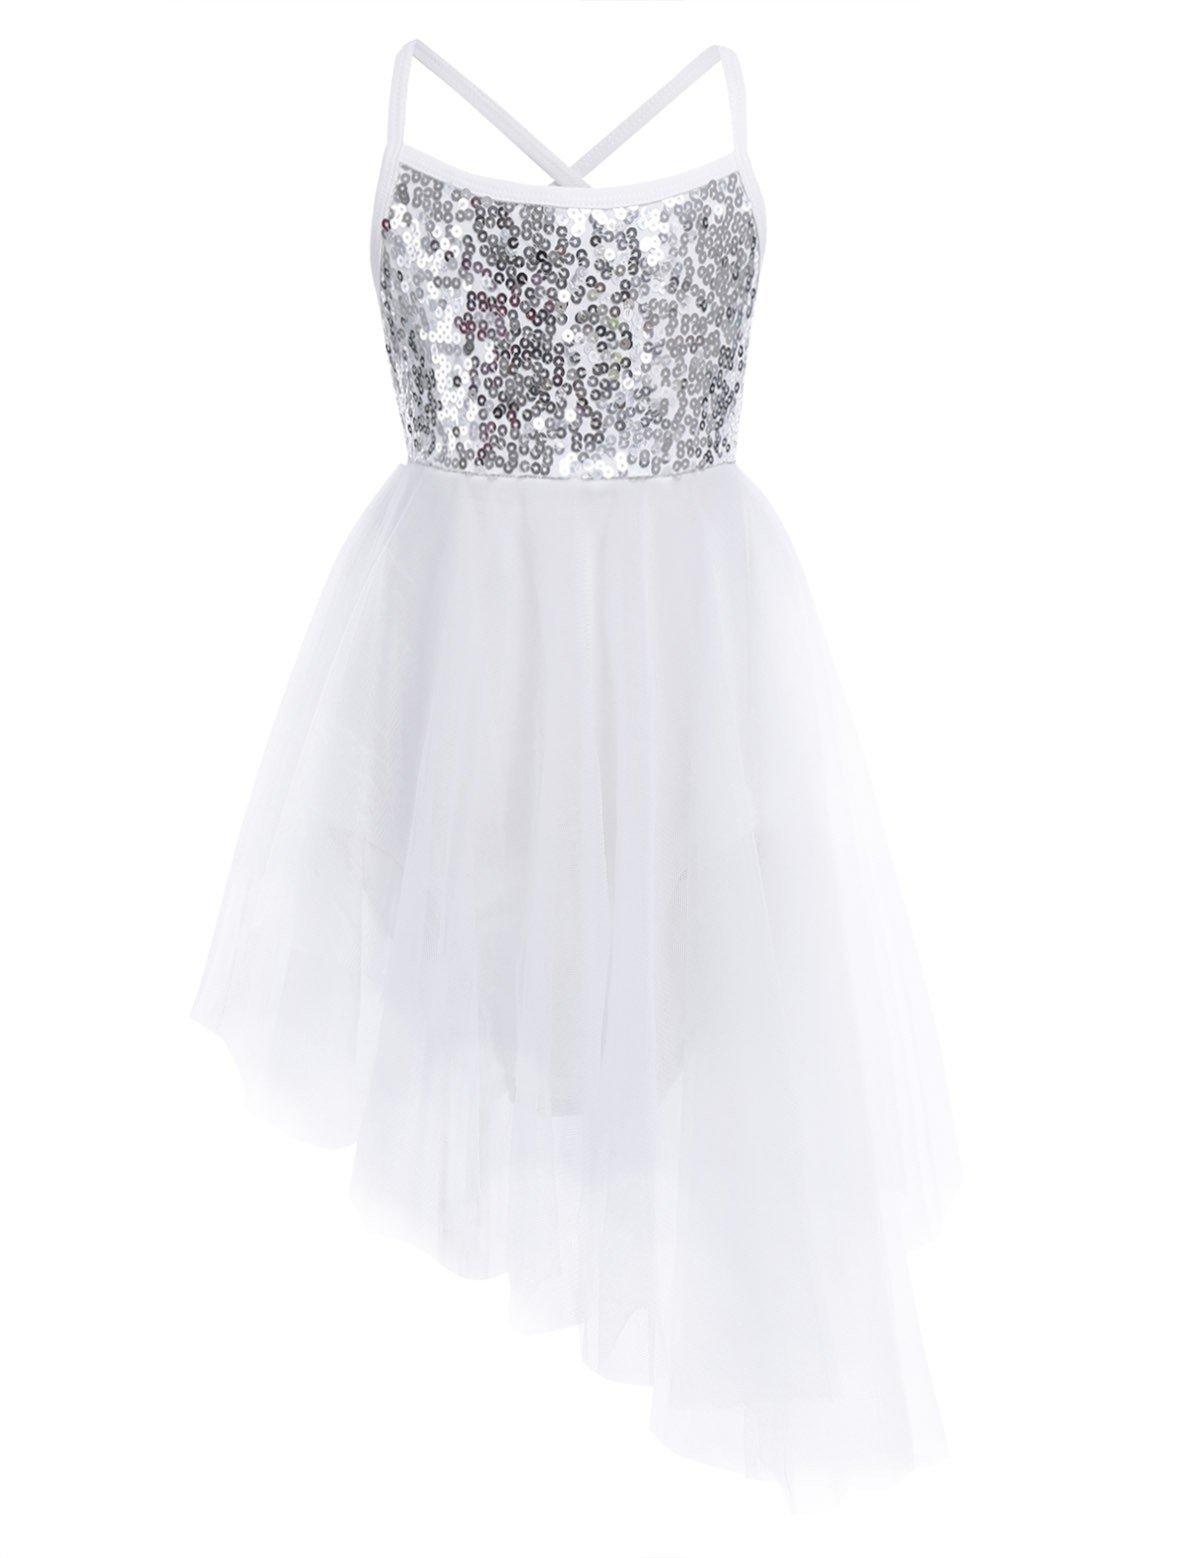 ballet tutu dress amazoncouk